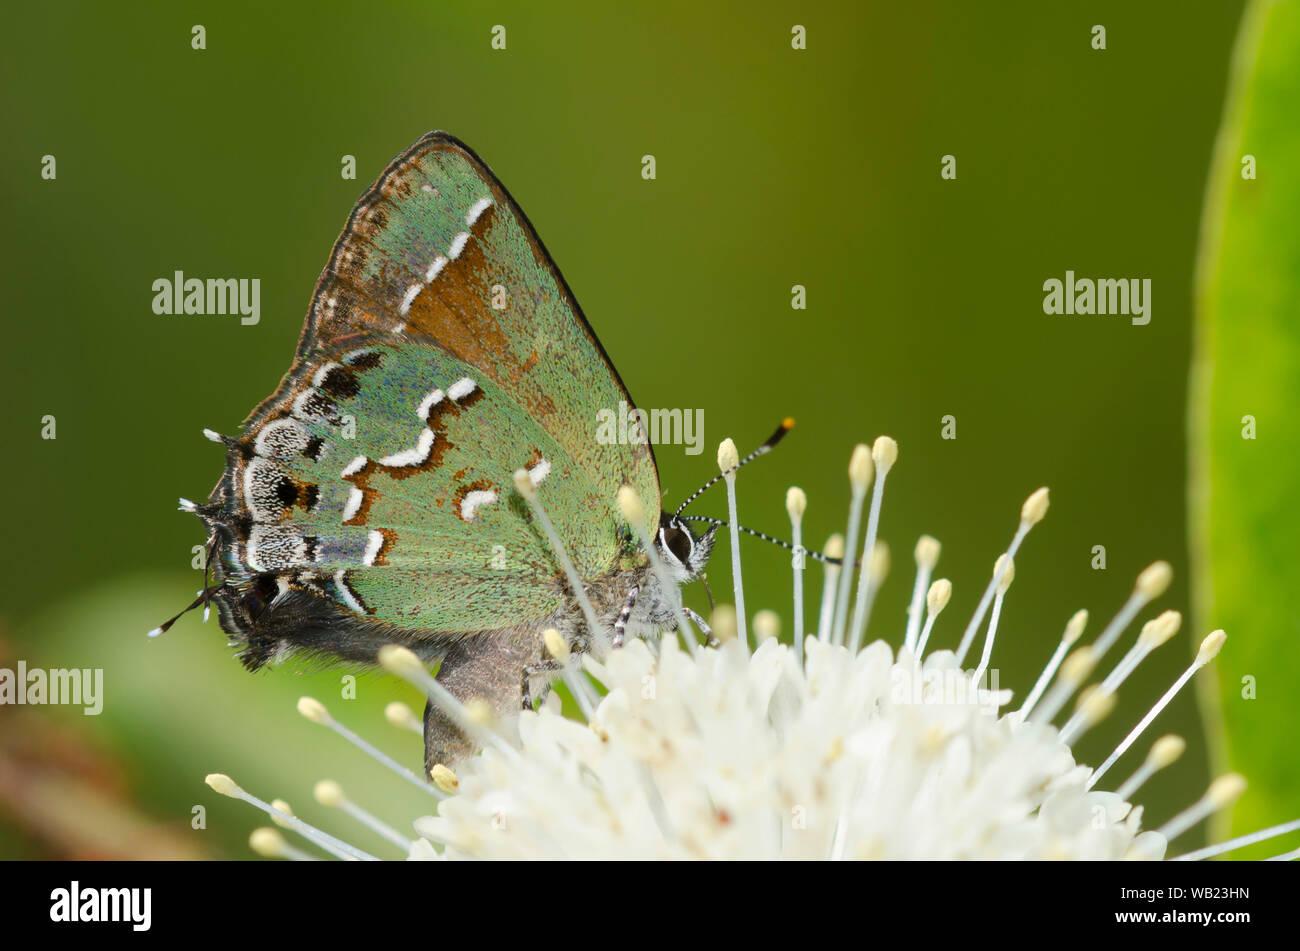 Juniper Hairstreak, Callophrys gryneus, nectaring on buttonbush, Cephalanthus occidentalis Stock Photo